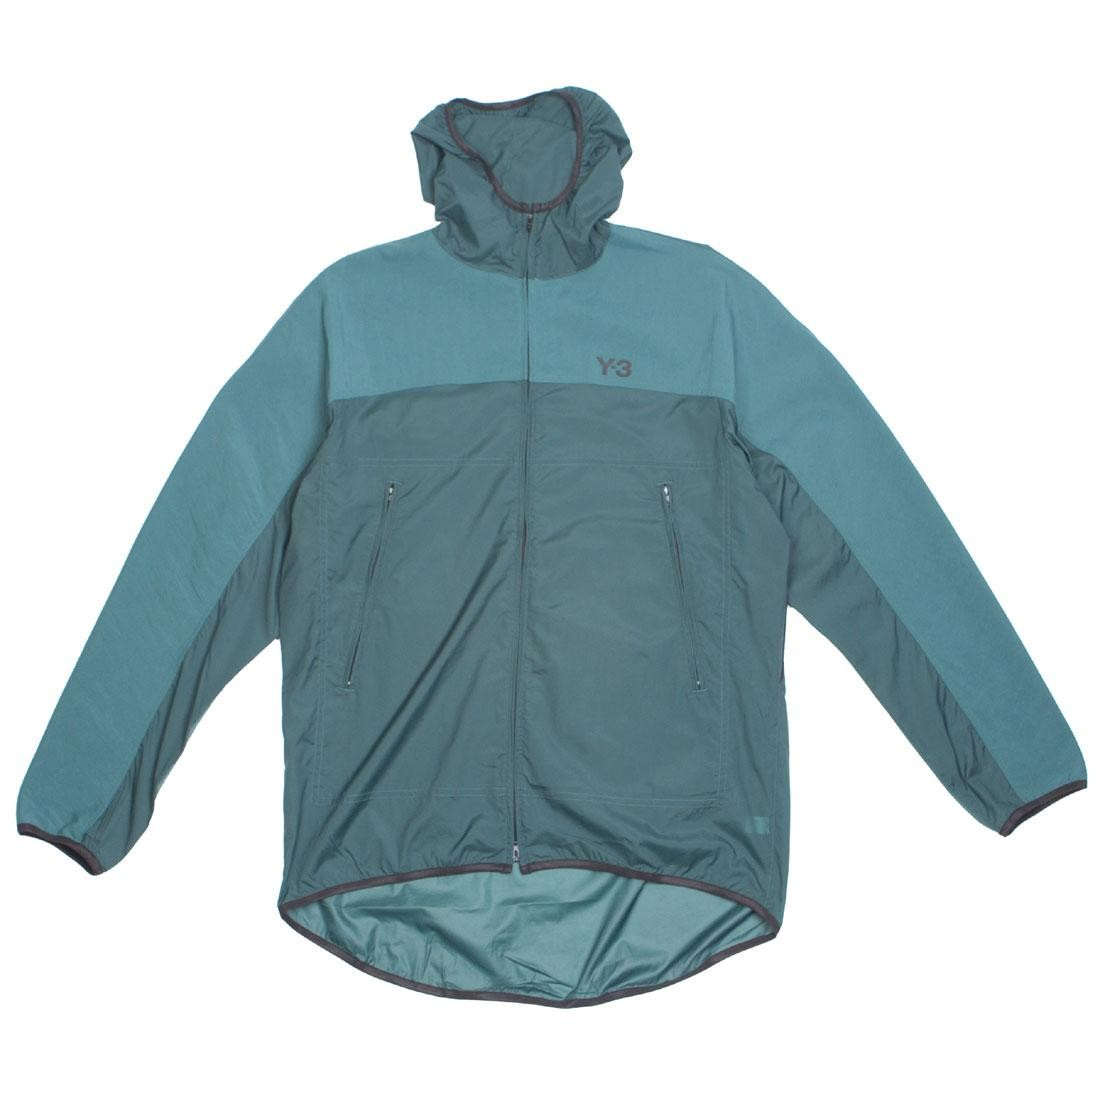 Adidas Y-3 Men Adizero Packable Jacket (green / petrol green)